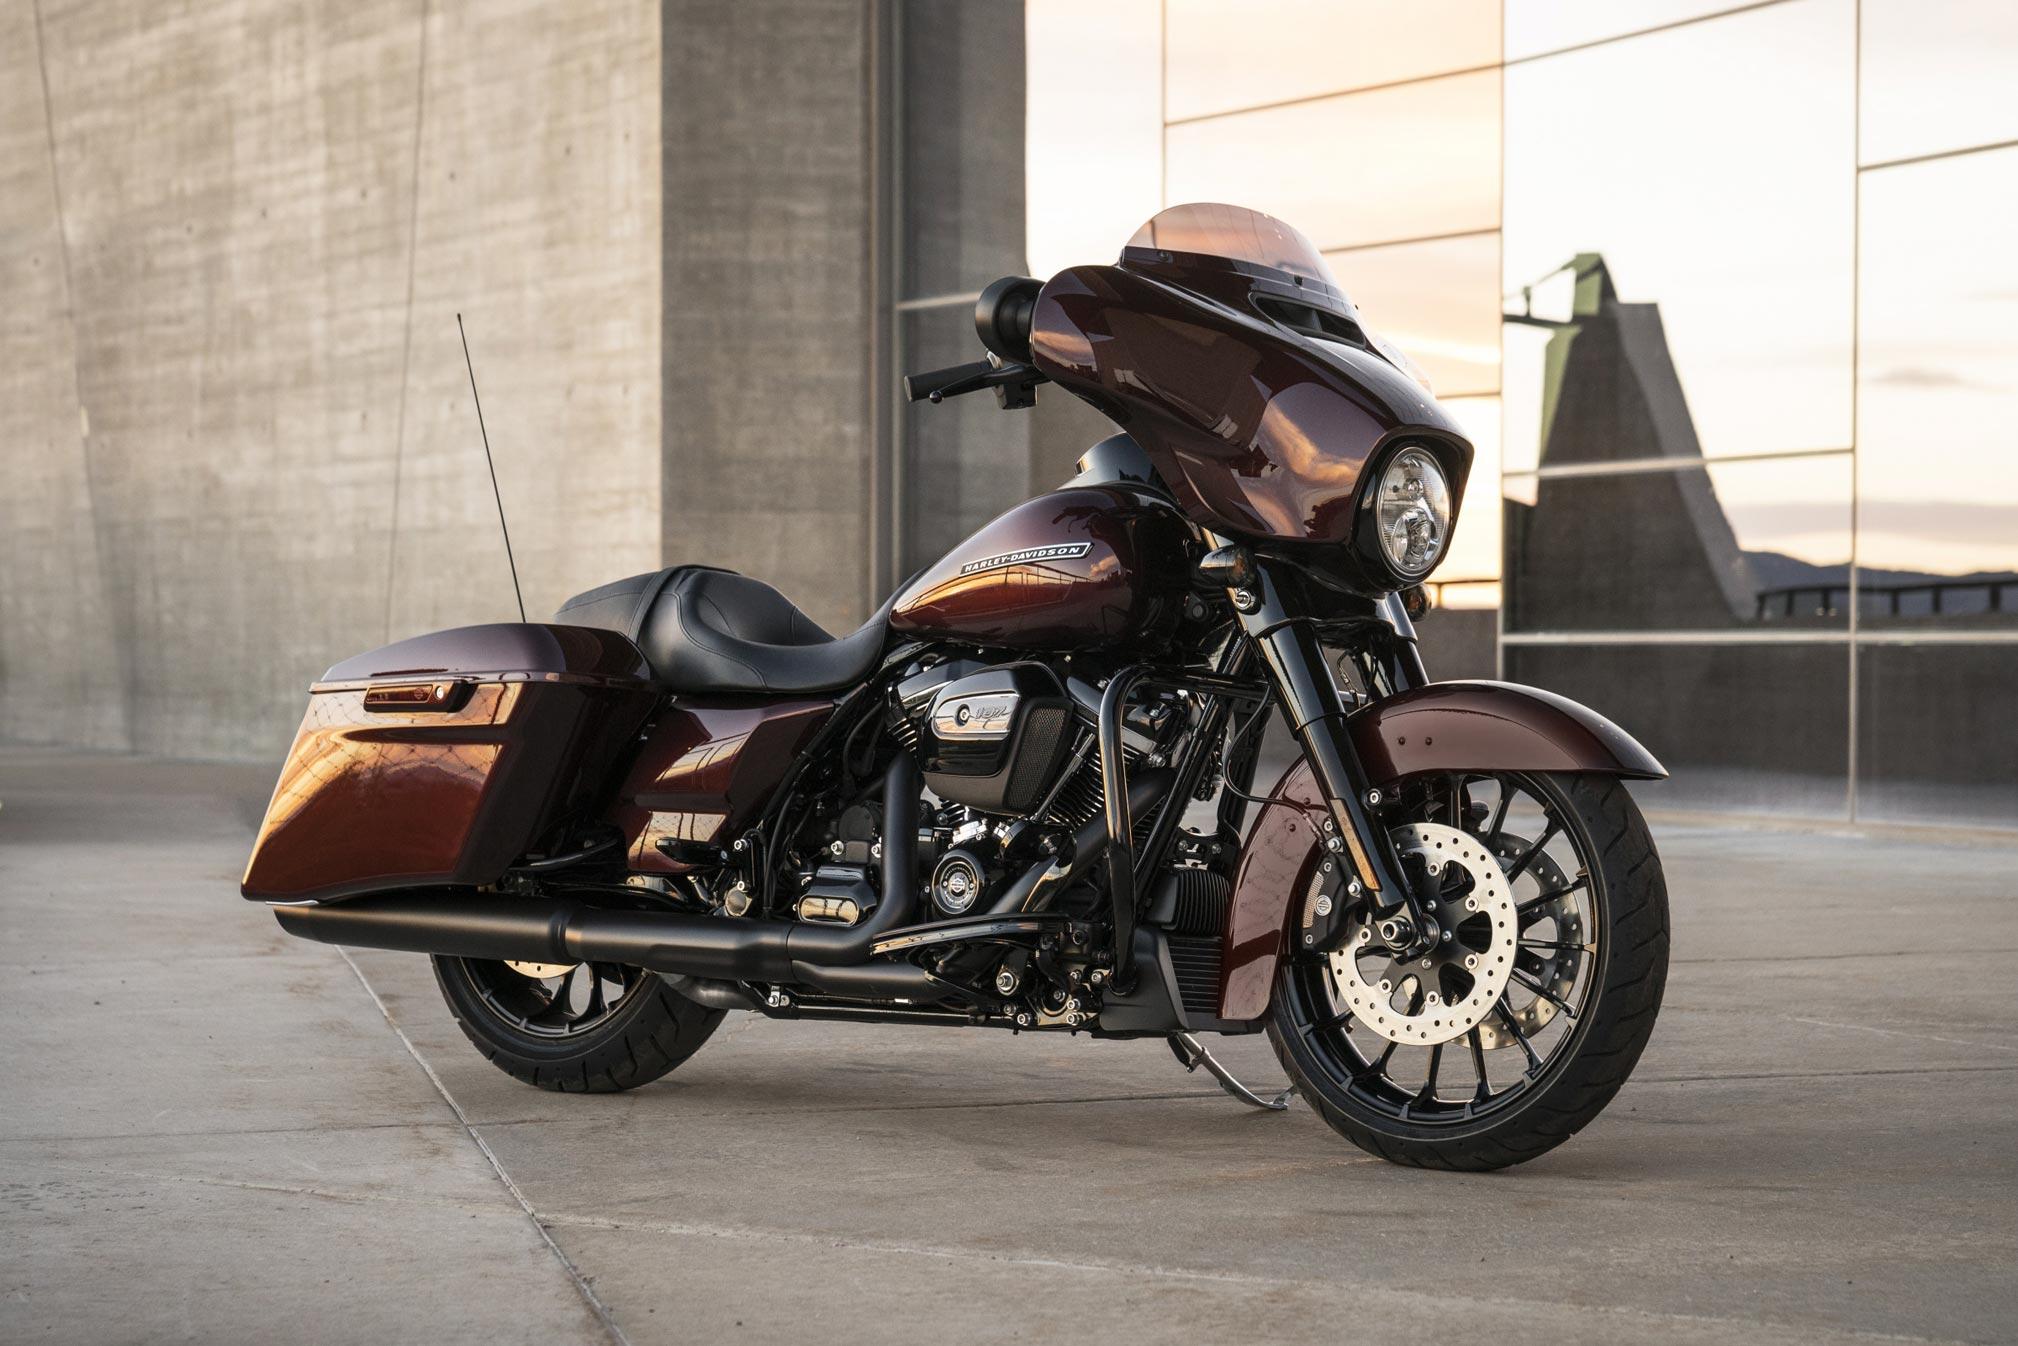 2018-Harley-Davidson-Street-Glide-Special1